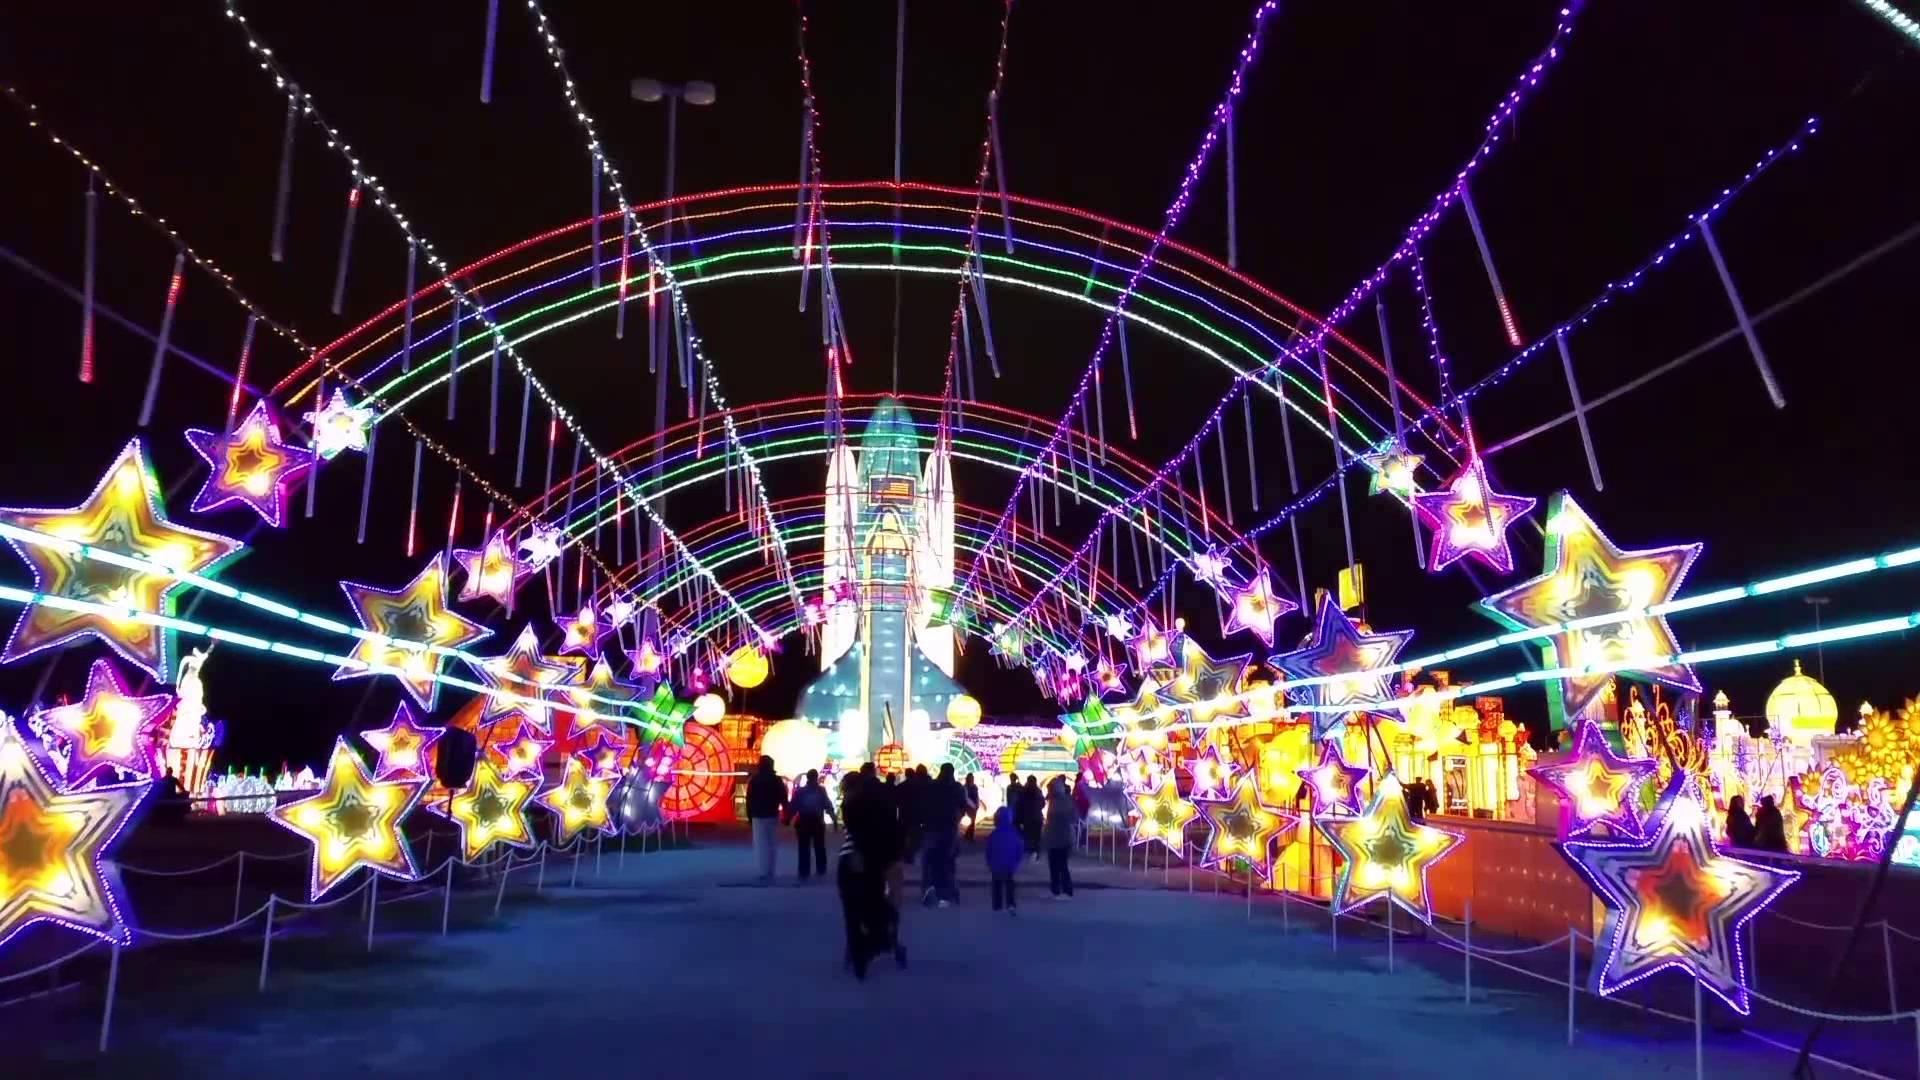 Magical Winter Lights - Houston 2016 - YouTube